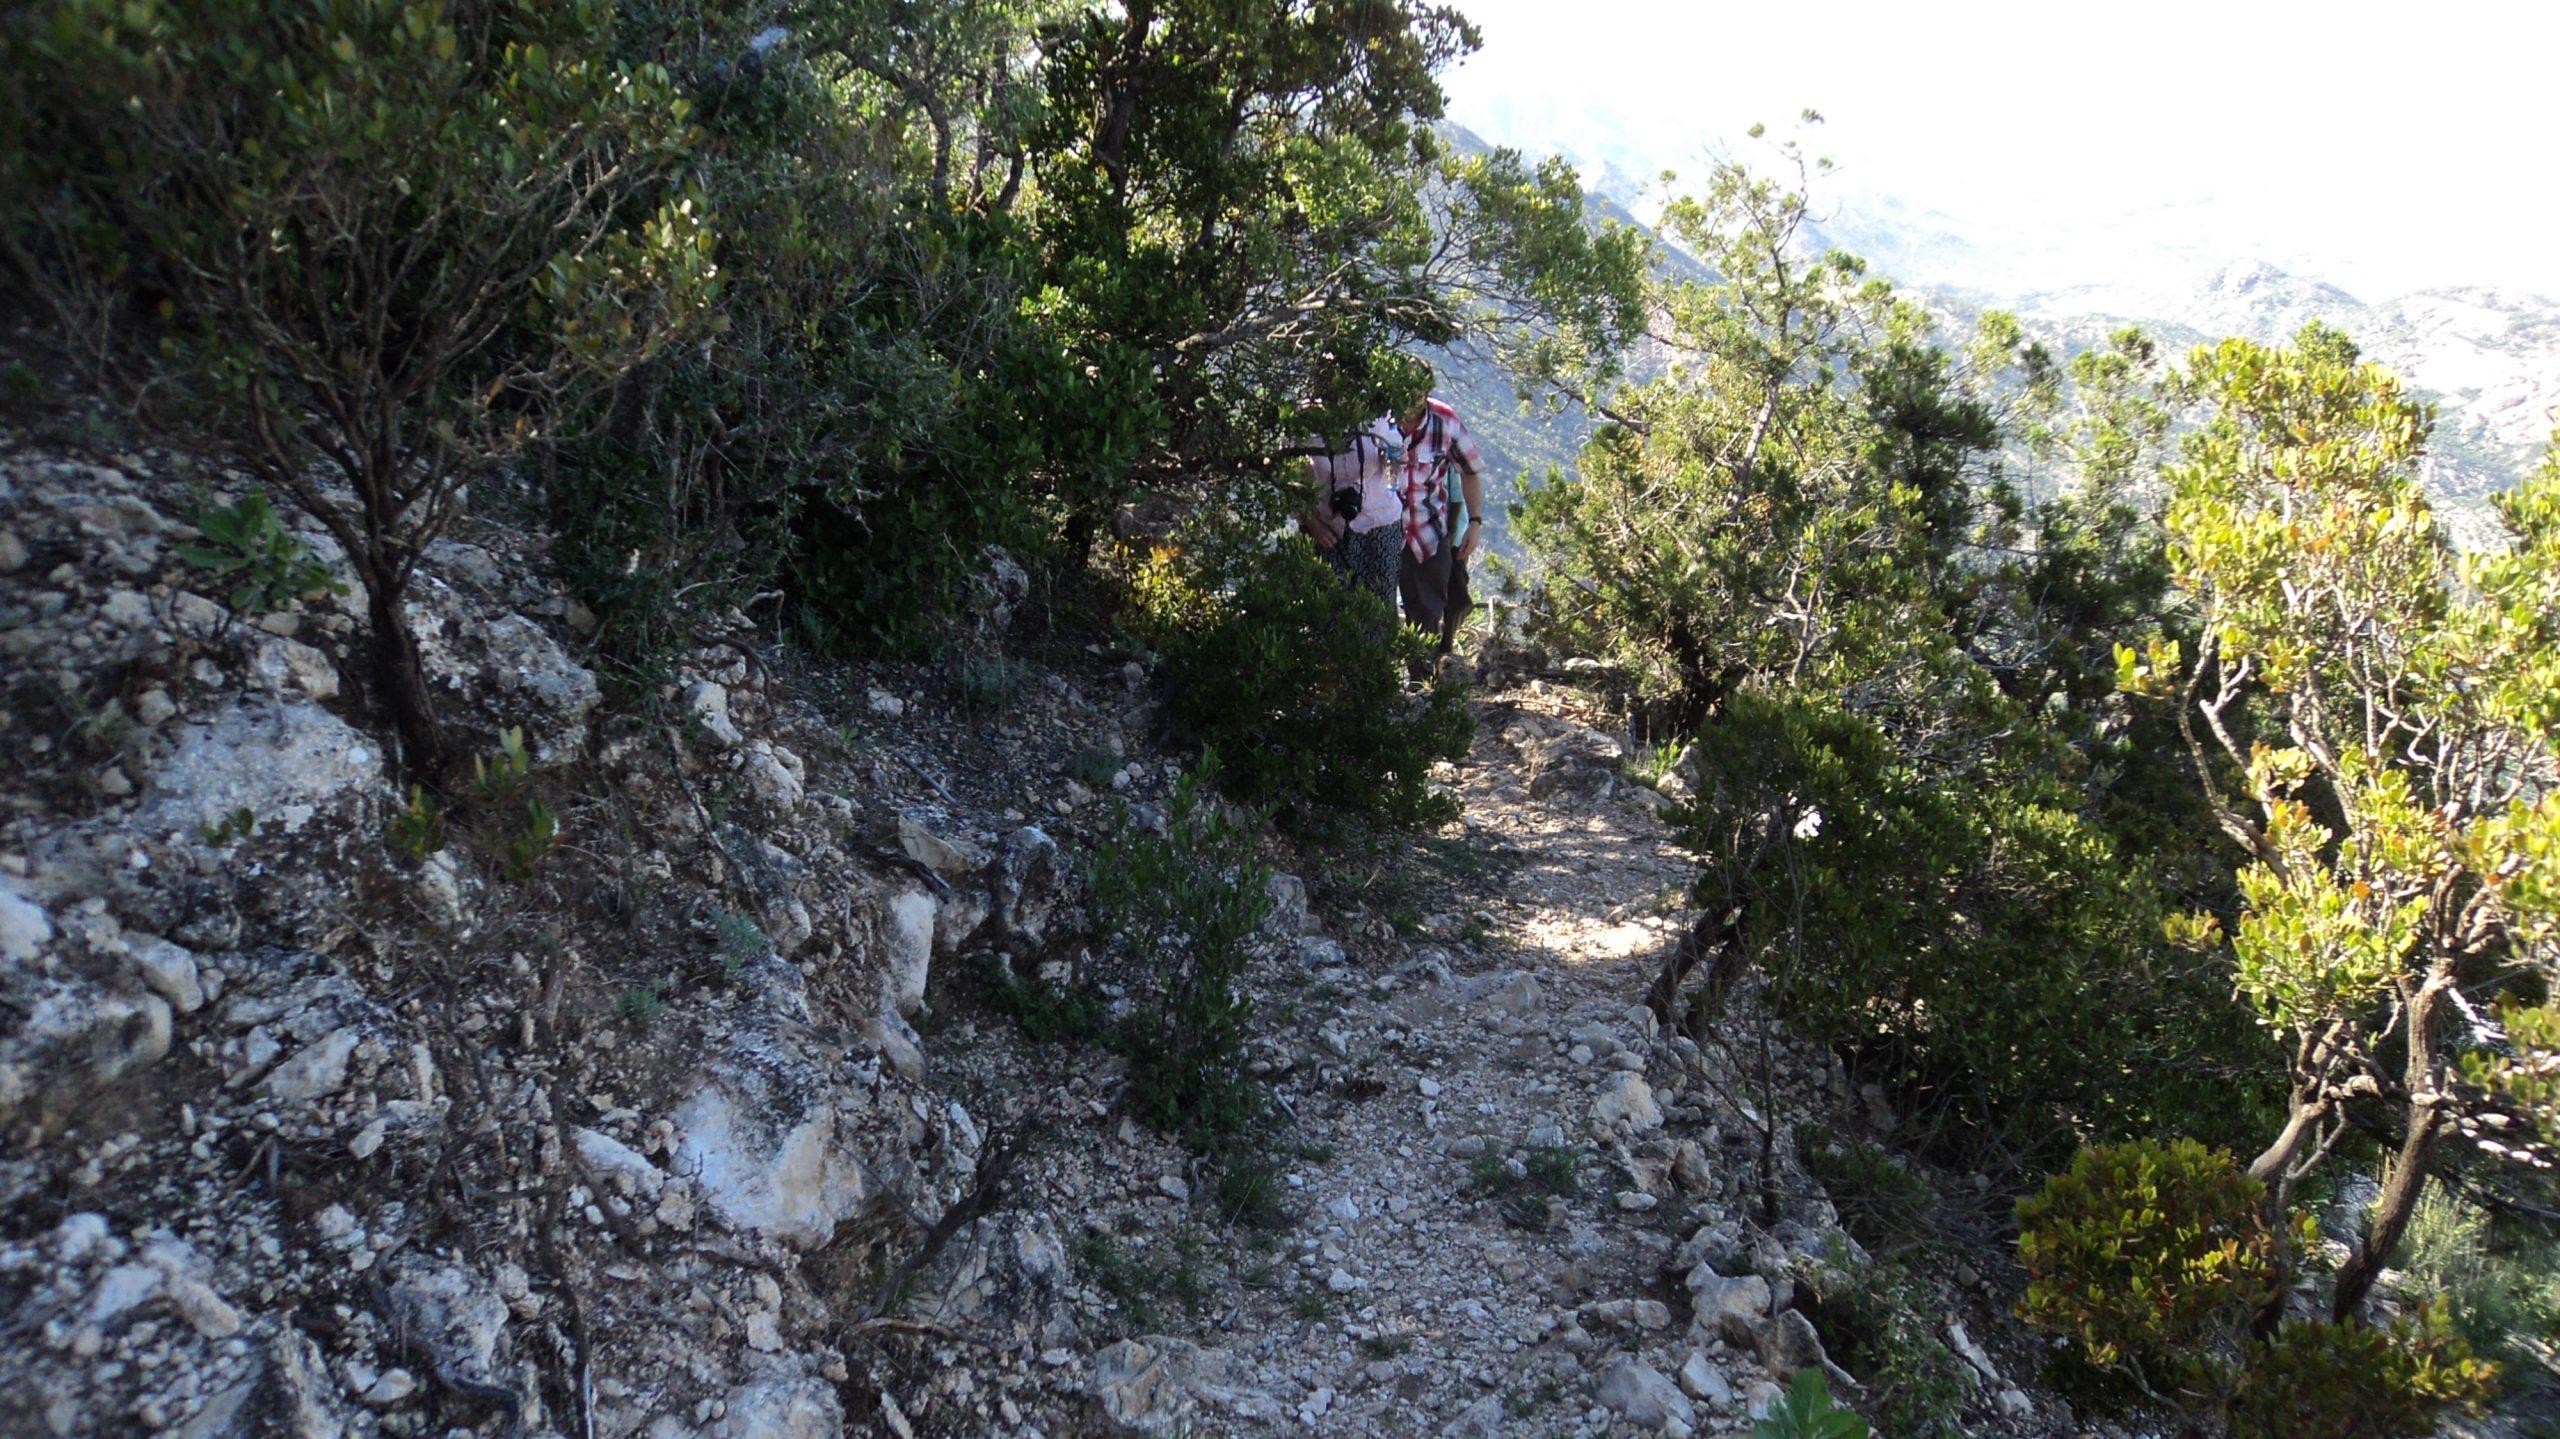 Mount Wagar